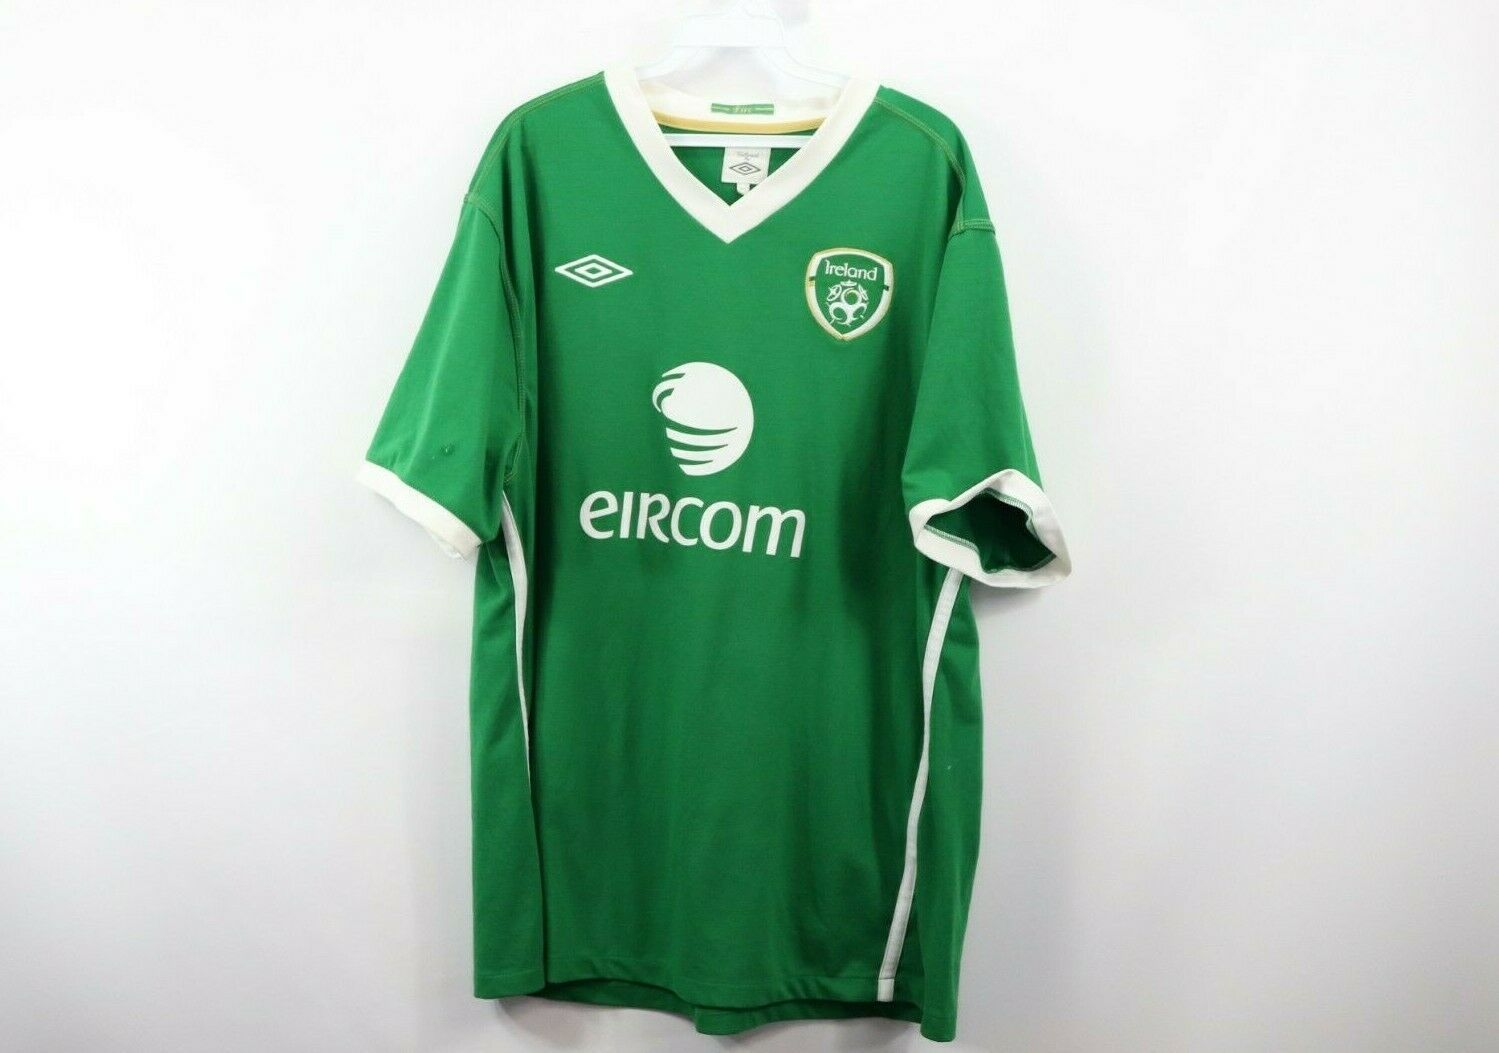 5f79a787a60 57. 57. Previous. Umbro Mens 2XL XXL Ireland Eircom World Cup Soccer Jersey  Futbol Green Eire